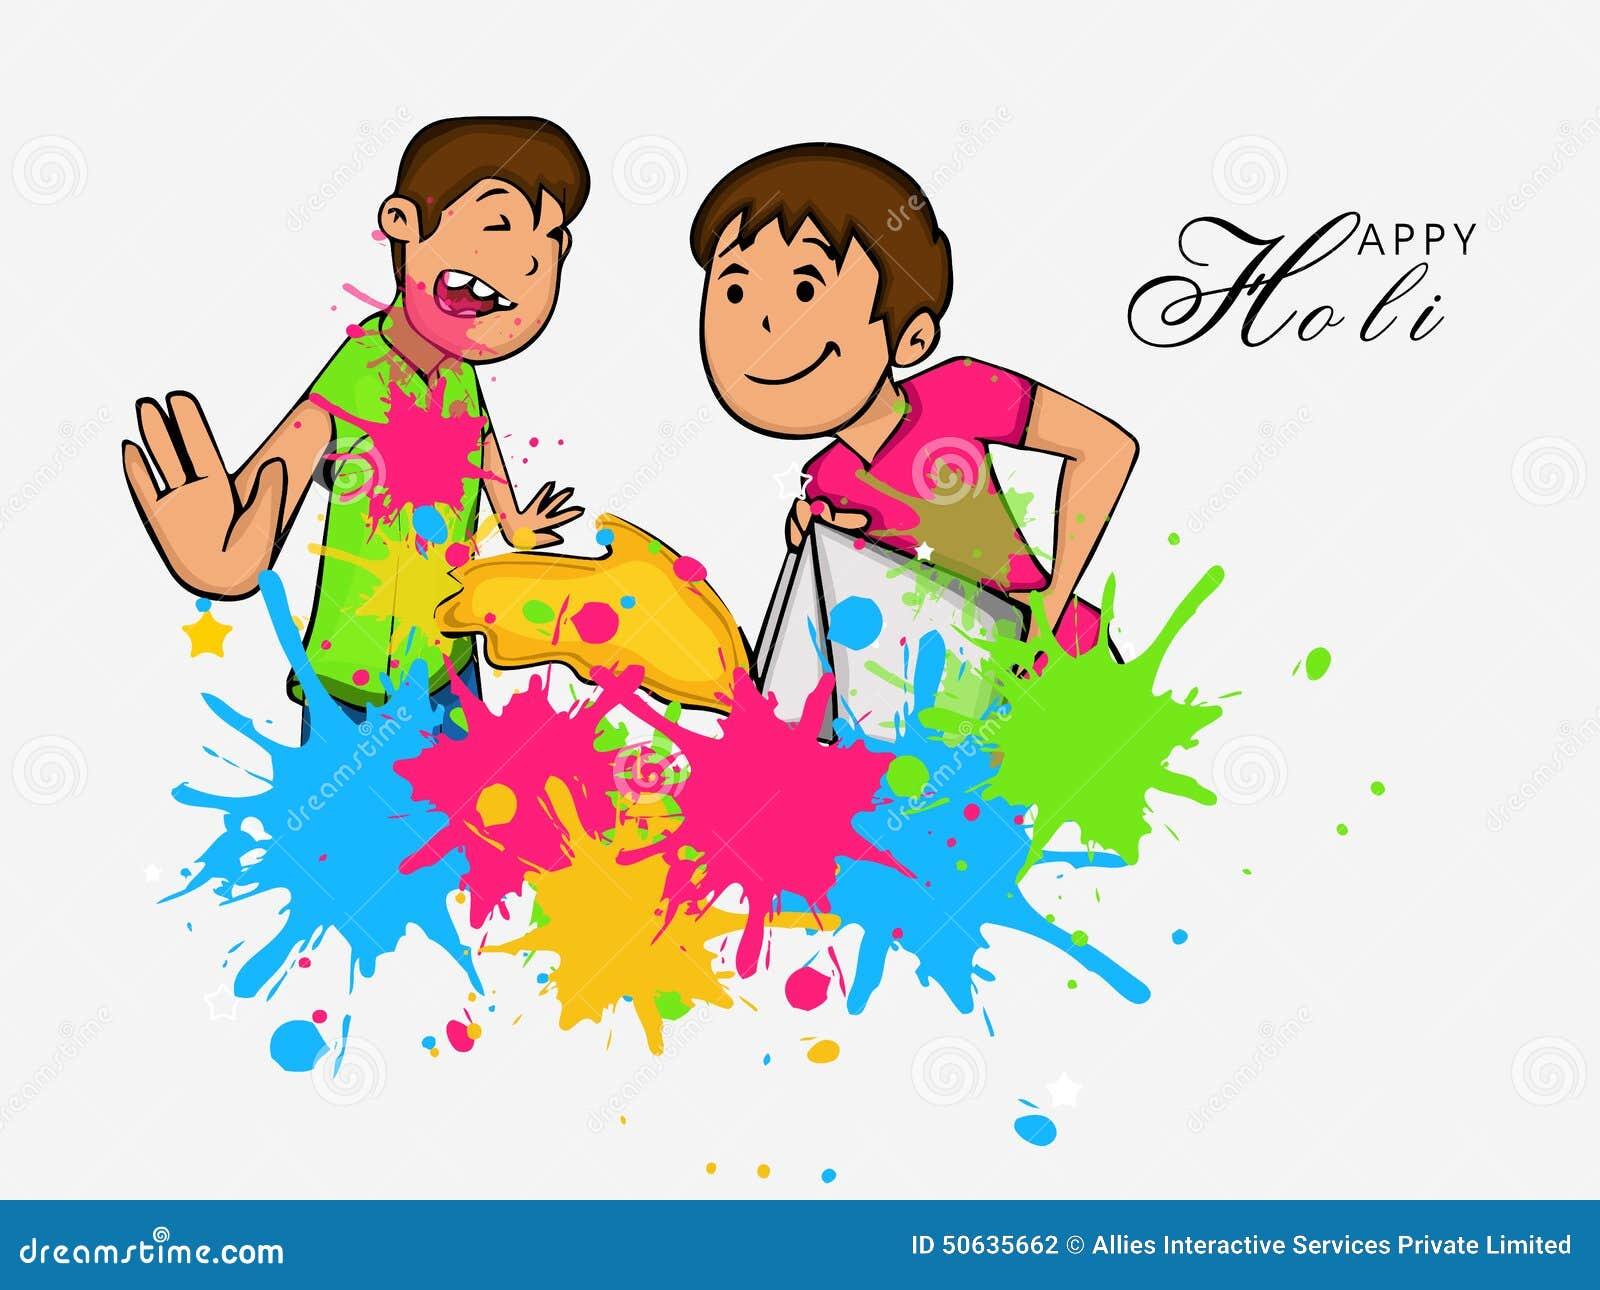 Cute Kids For Happy Holi Festival Celebration Stock